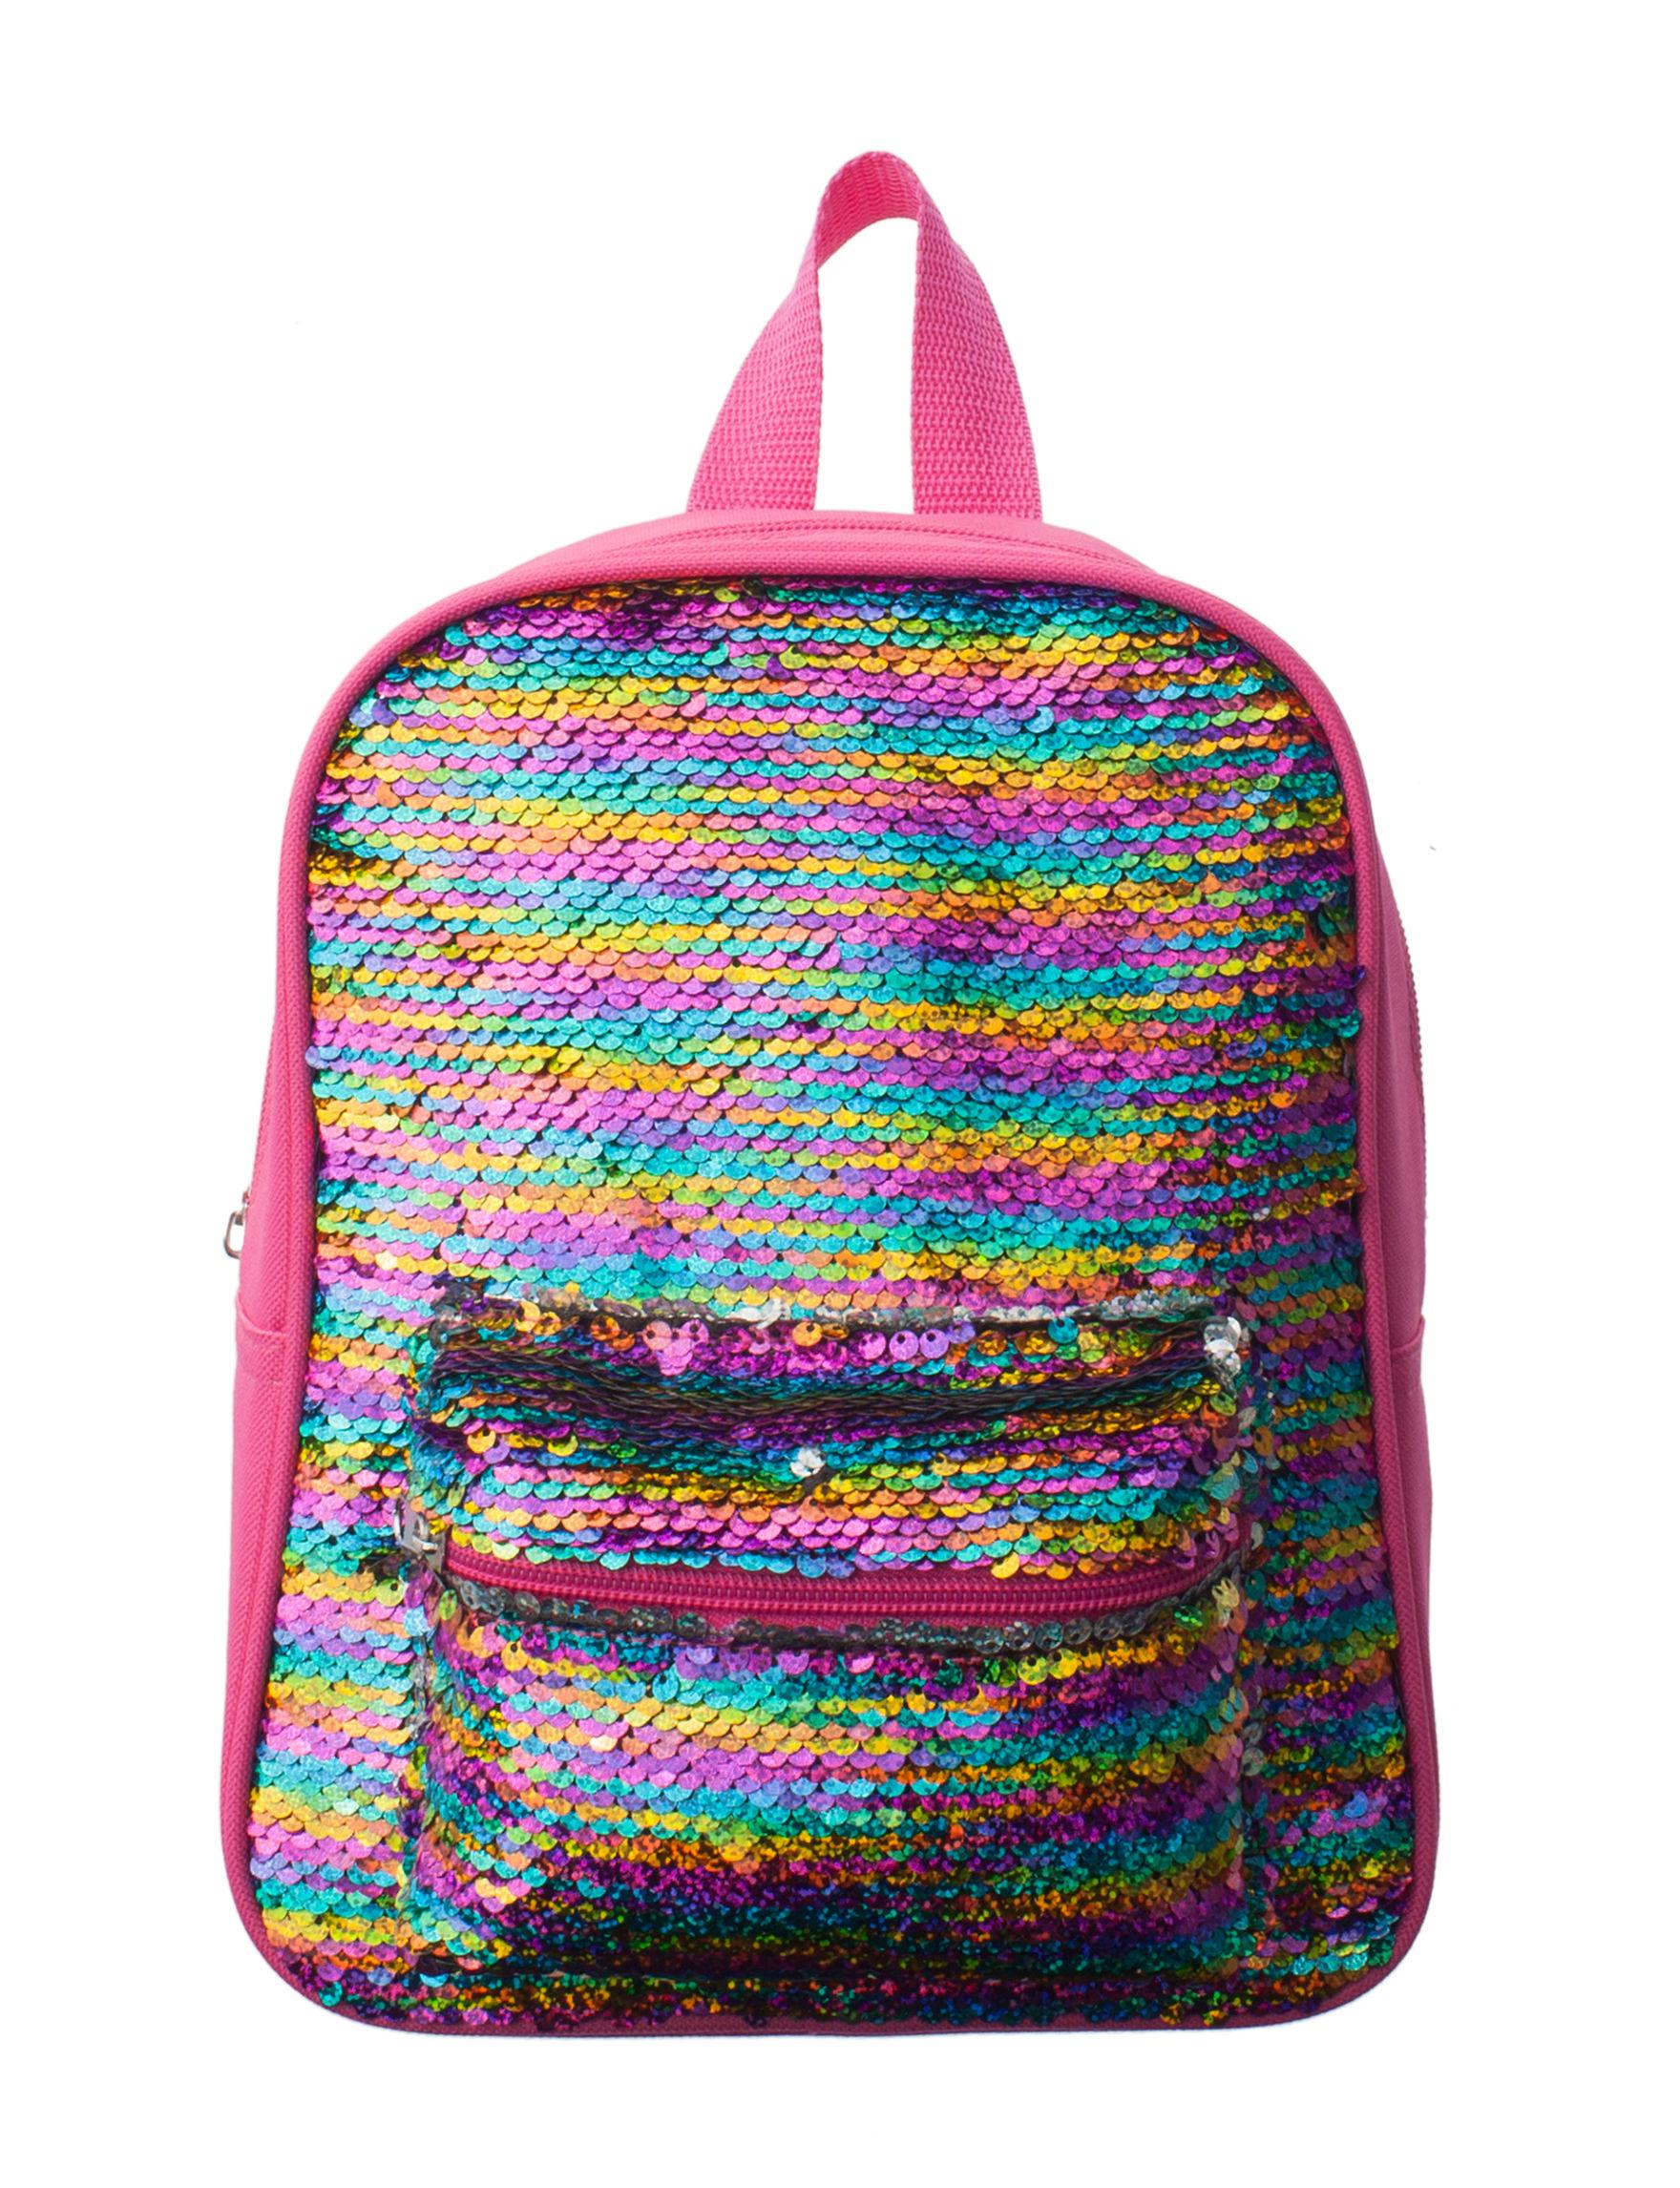 Confetti Pink Multi Bookbags & Backpacks